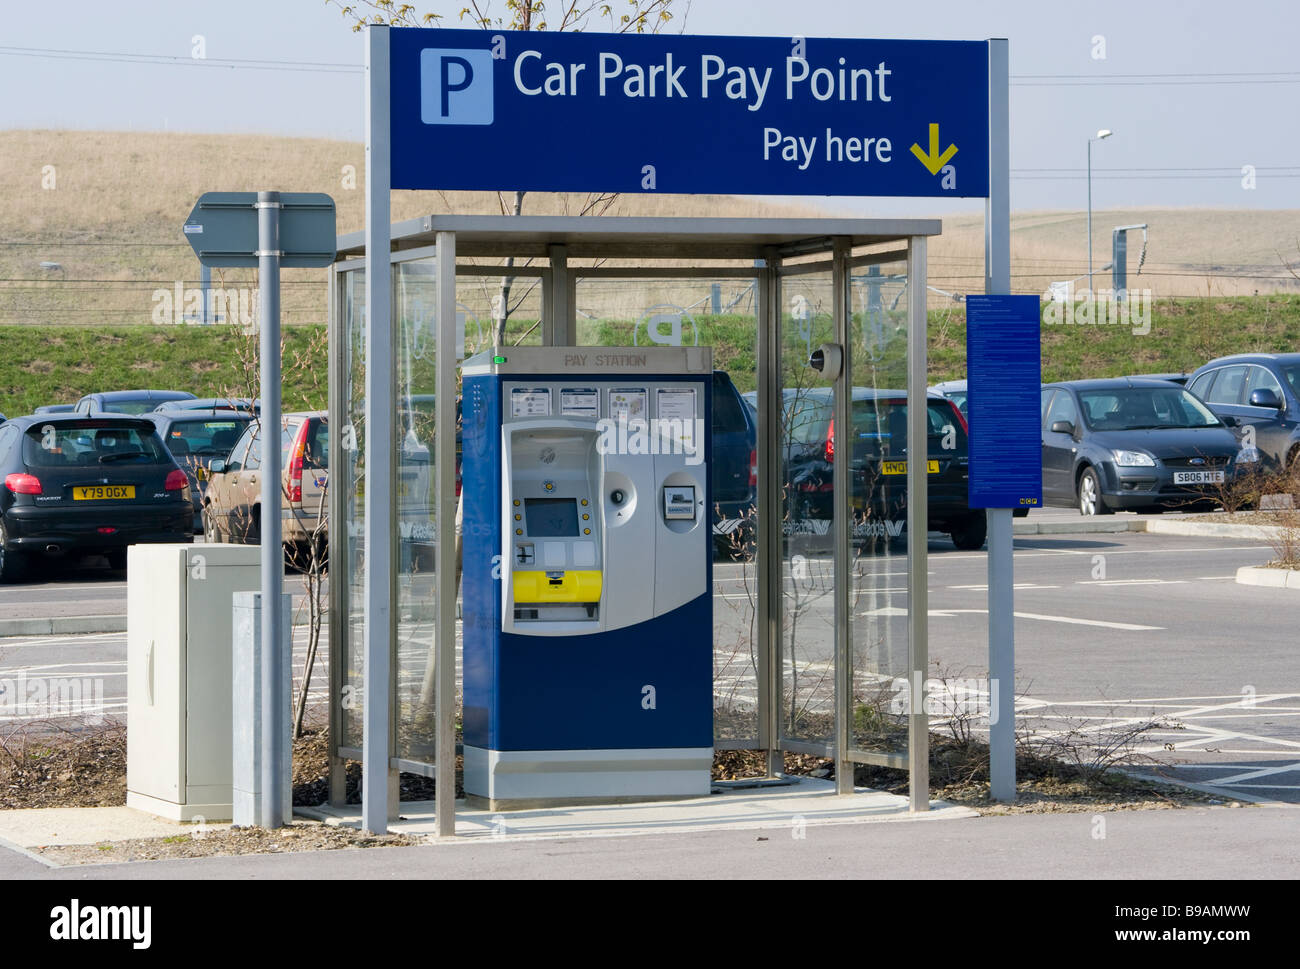 Pay Ncp Car Park